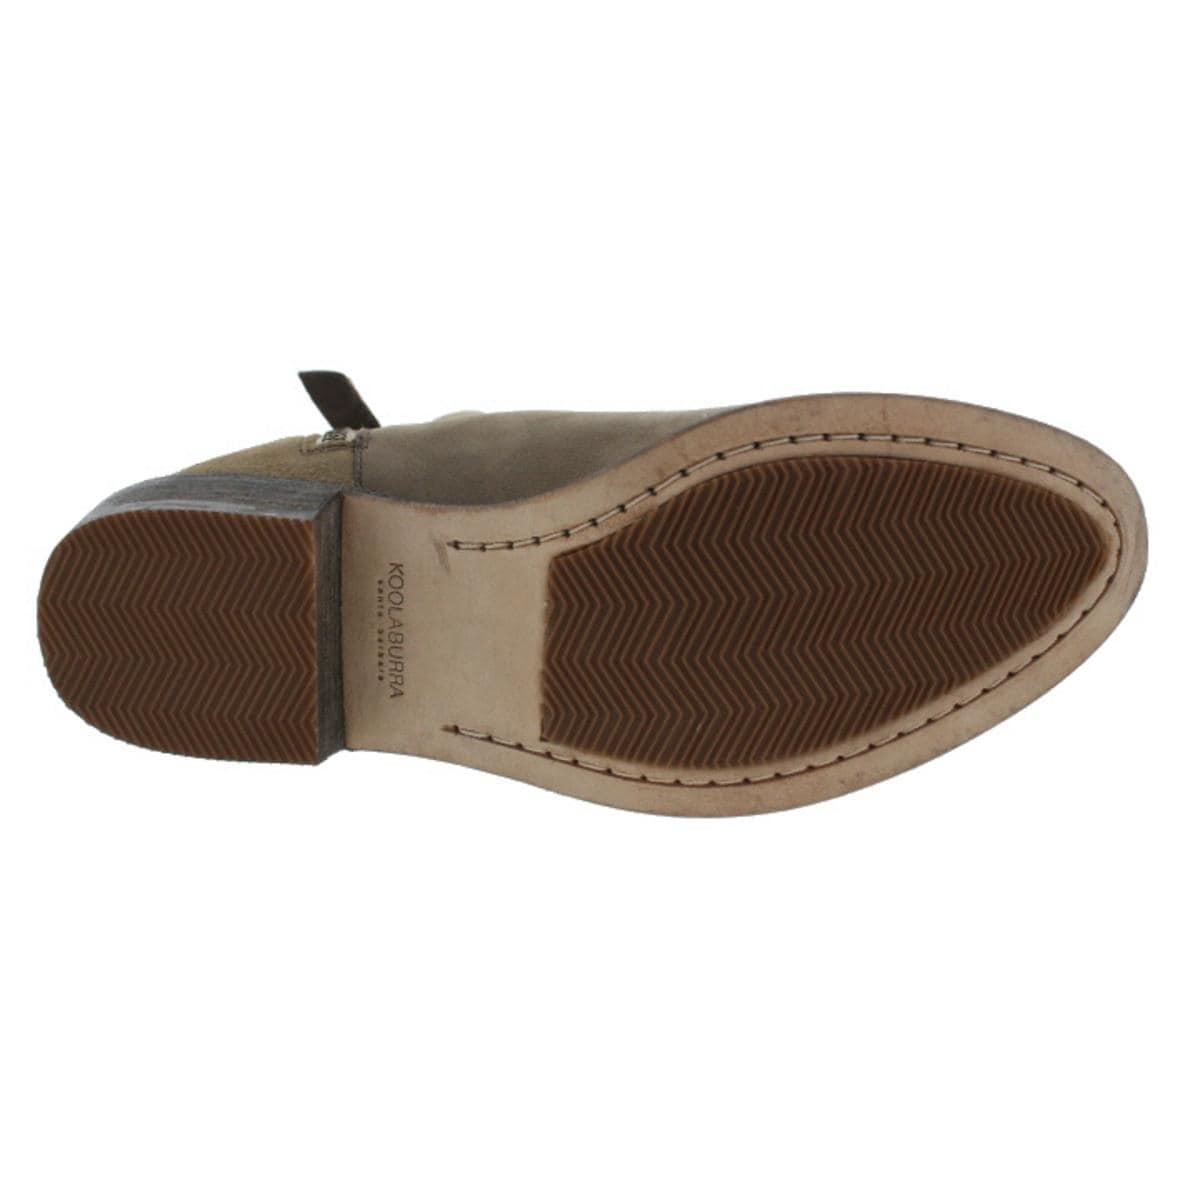 3b51be27915 Koolaburra Womens Dallas Ankle Boots Leather Fringe